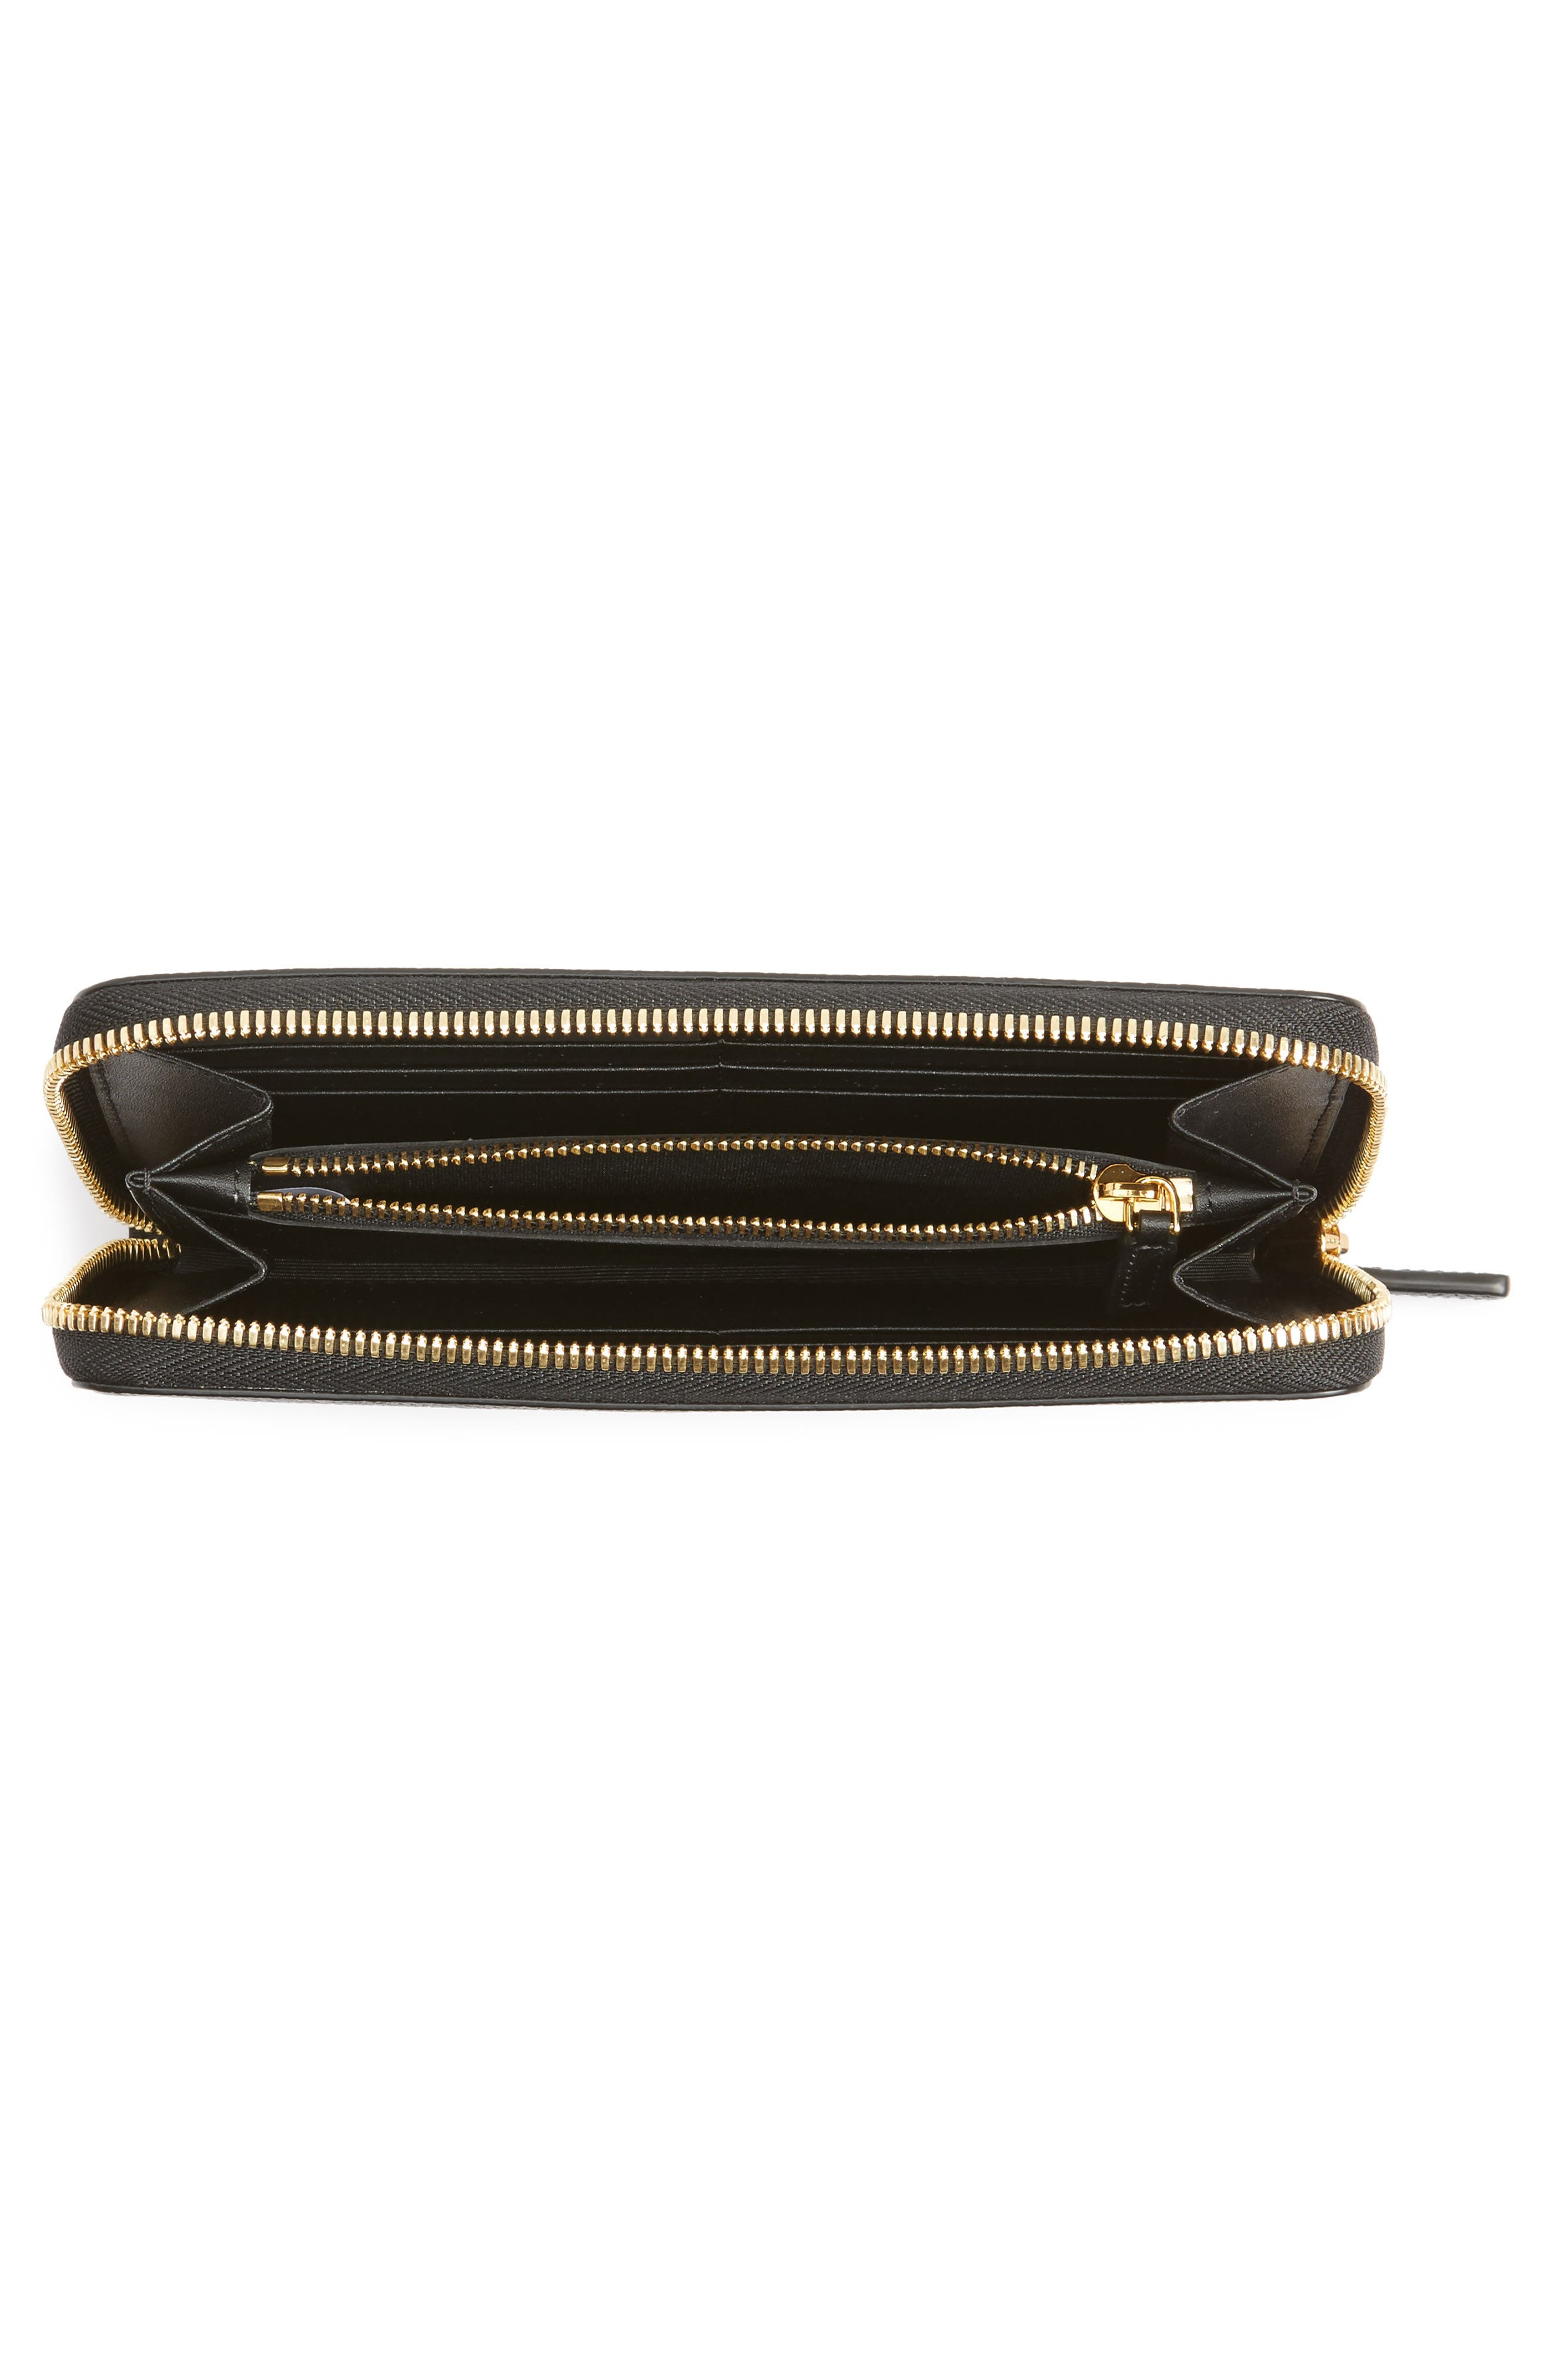 Milla Leather Zip Around Wallet,                             Alternate thumbnail 2, color,                             001